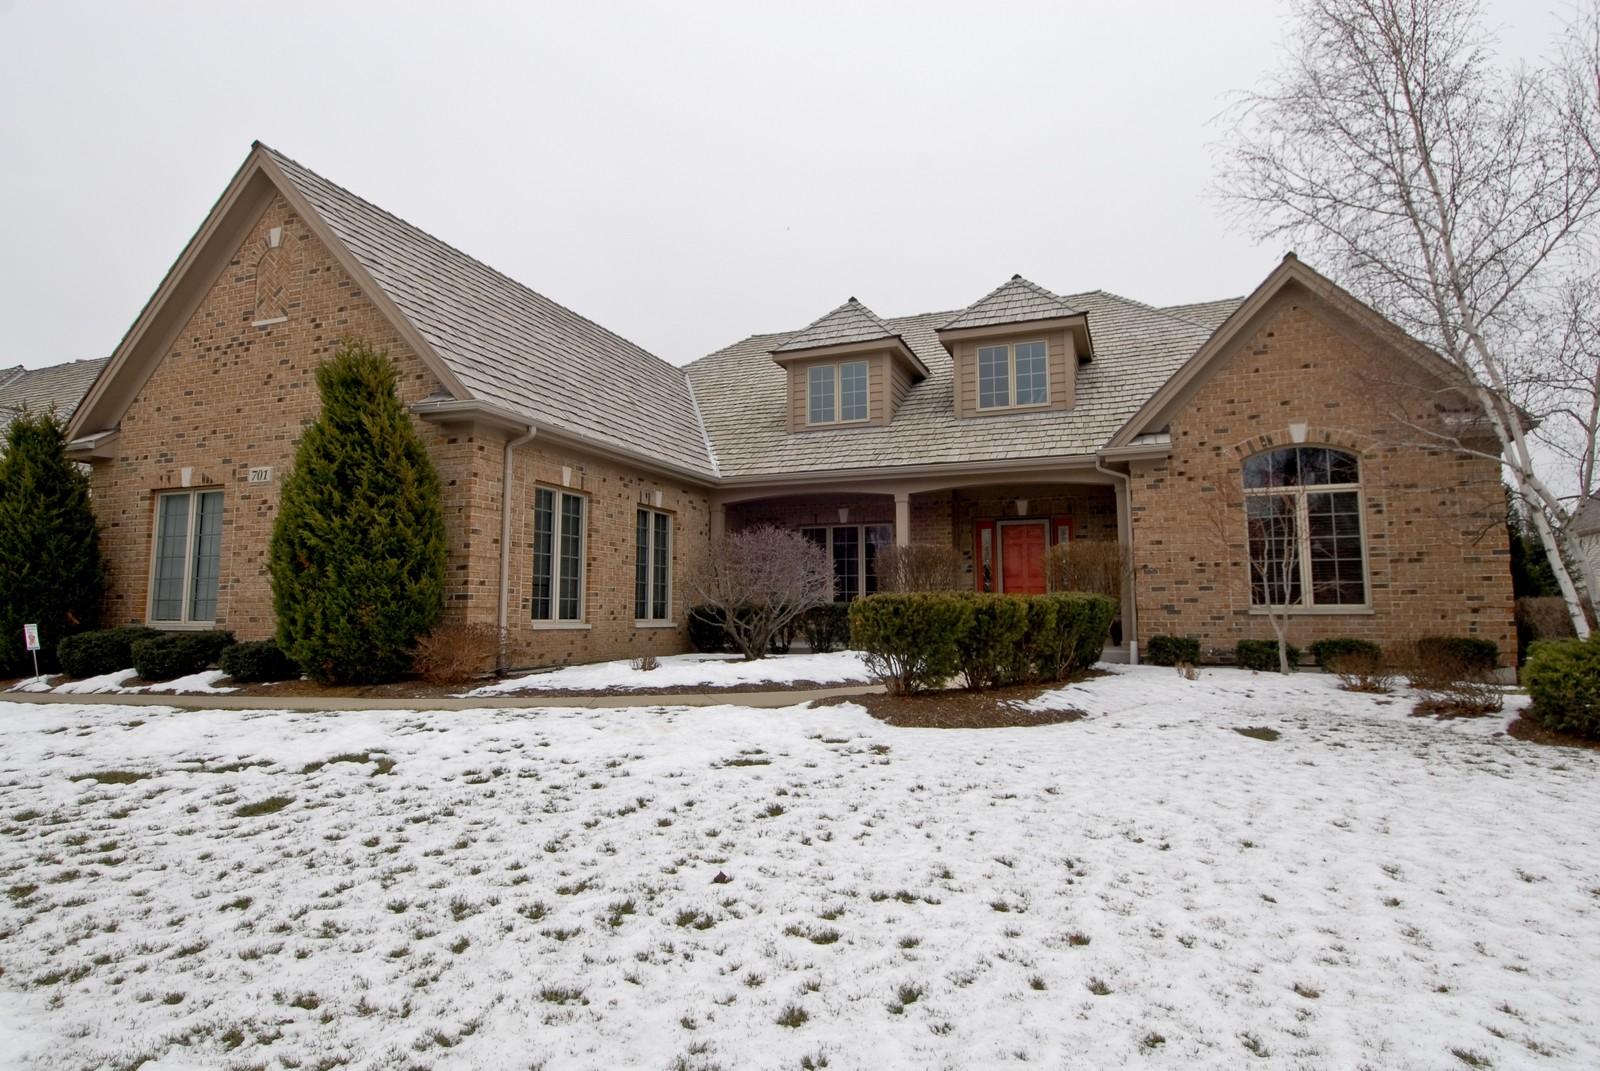 Real Estate Photography - 701 Ashton Ln, South Elgin, IL, 60177 - Front View